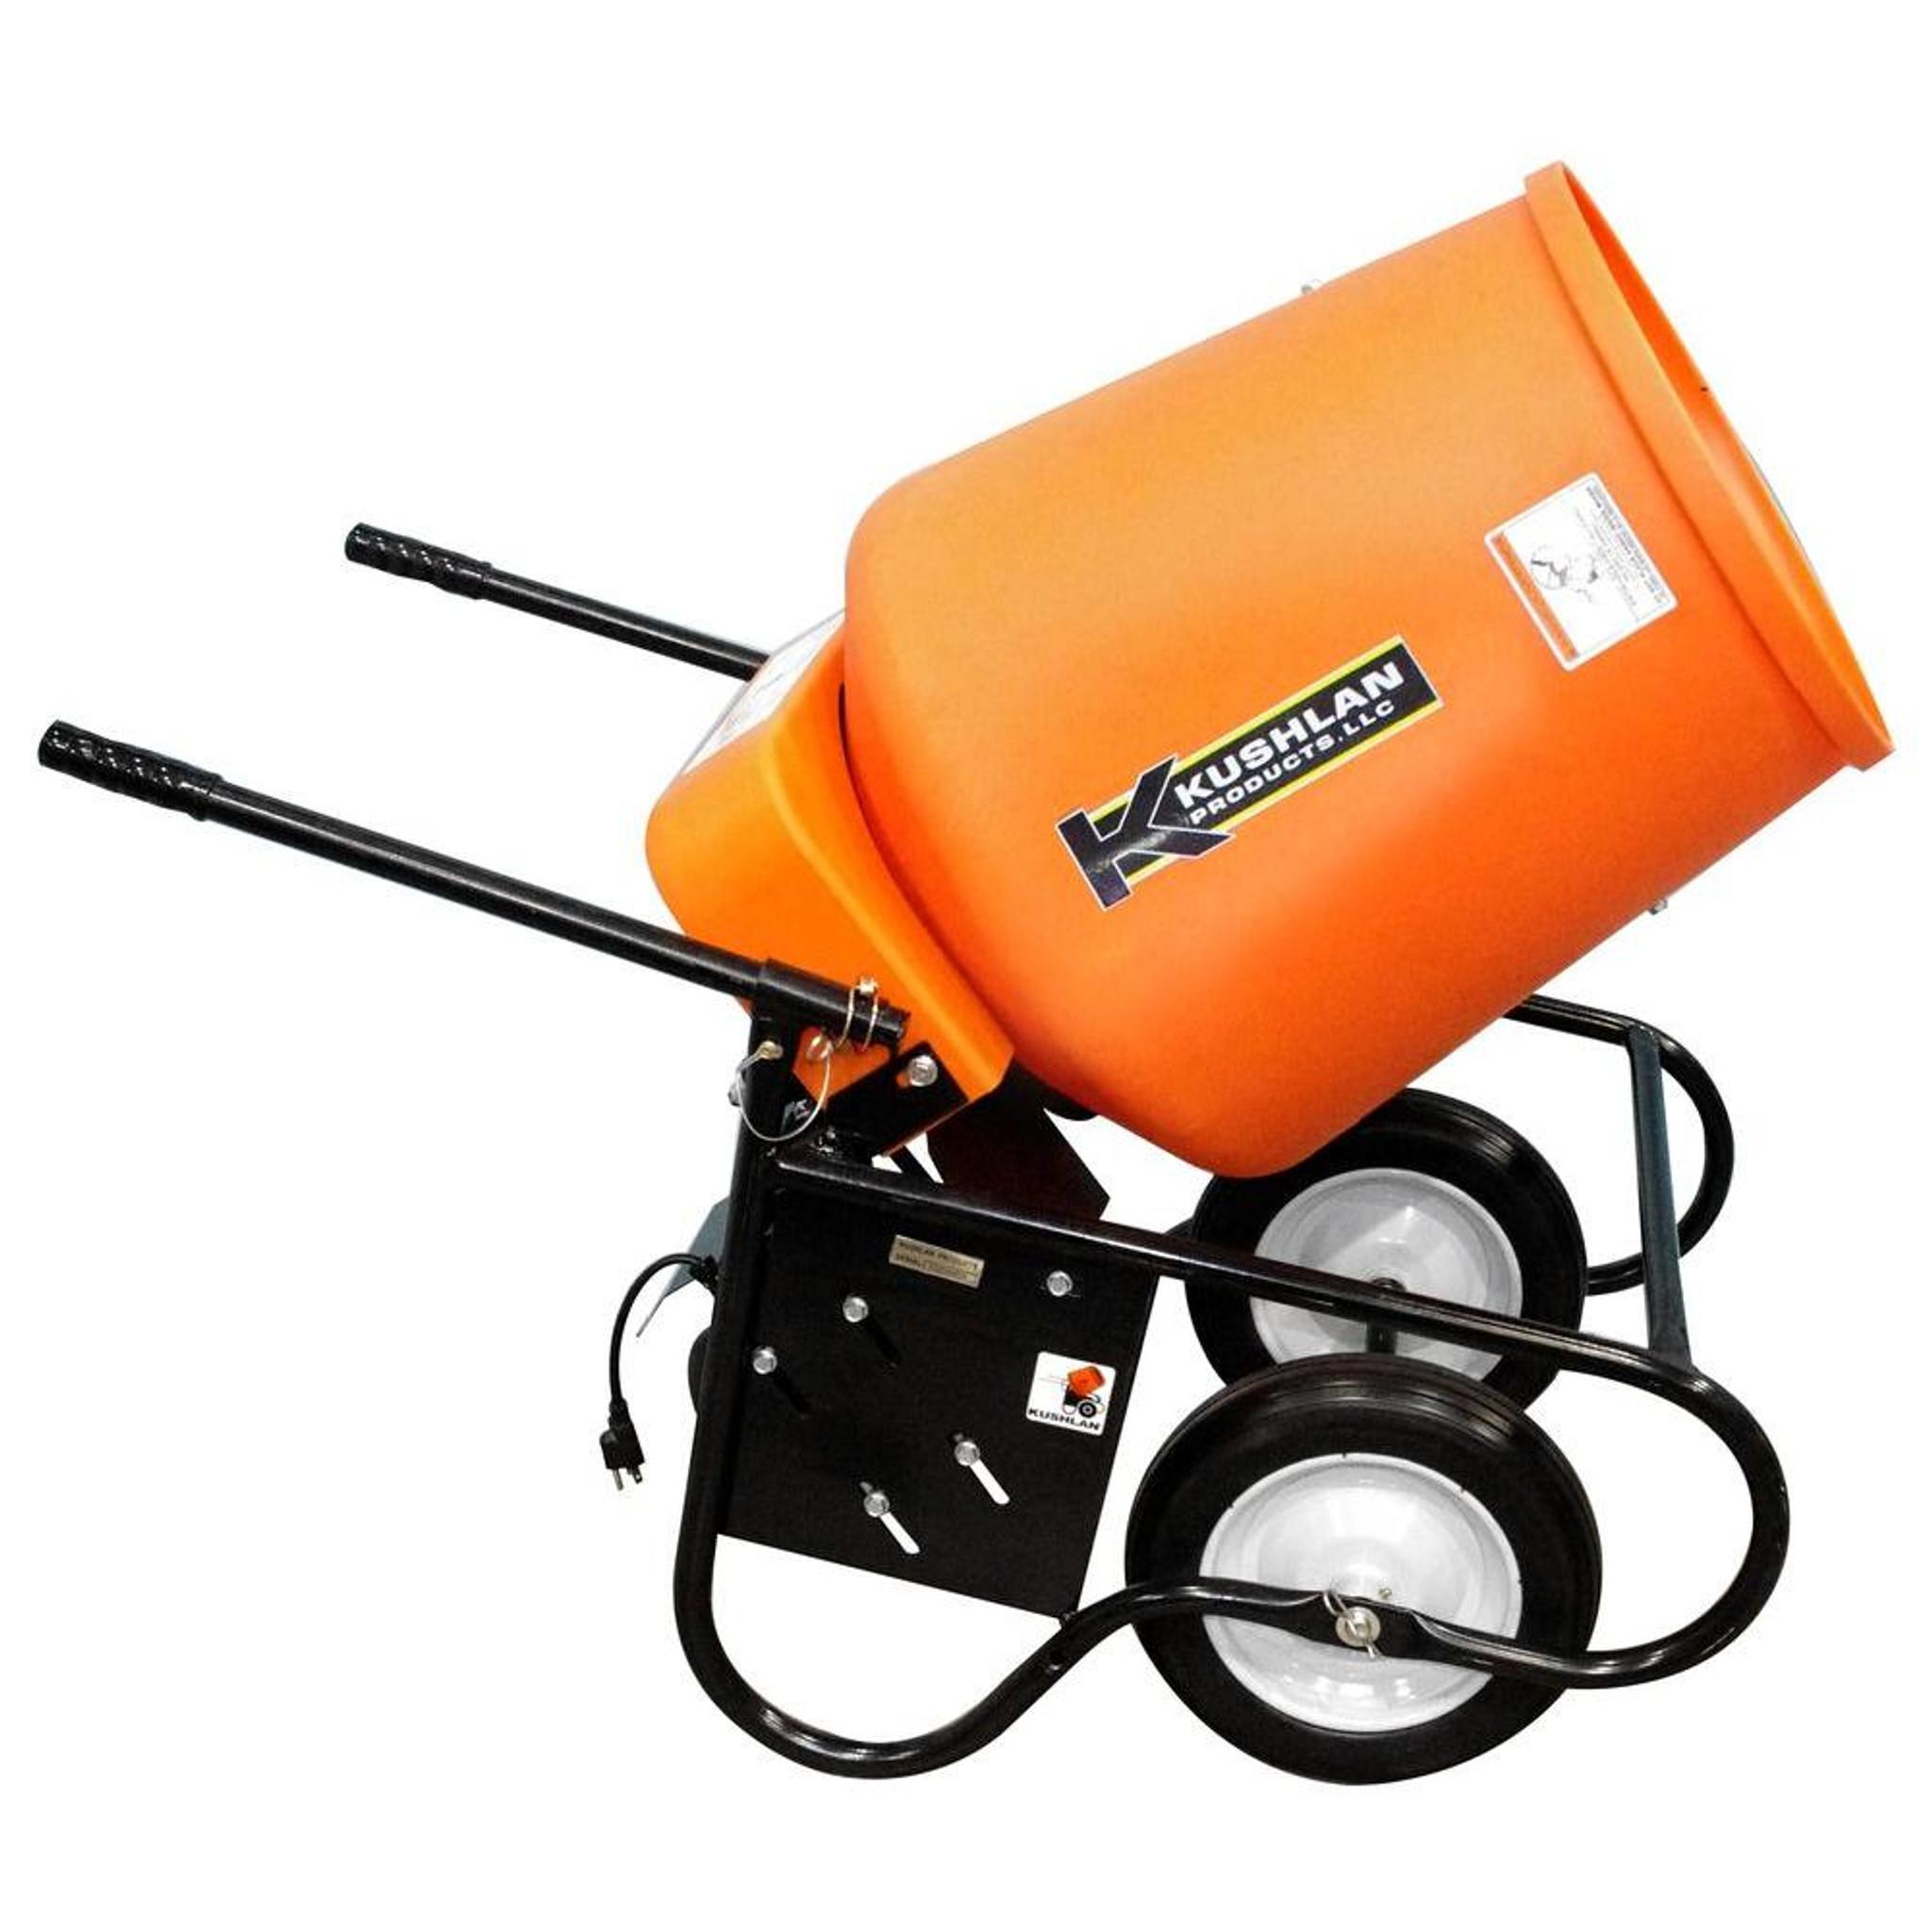 3 5 Cu Ft Electric Wheelbarrow Concrete Mixer Rental Starting At Abcwnyrental